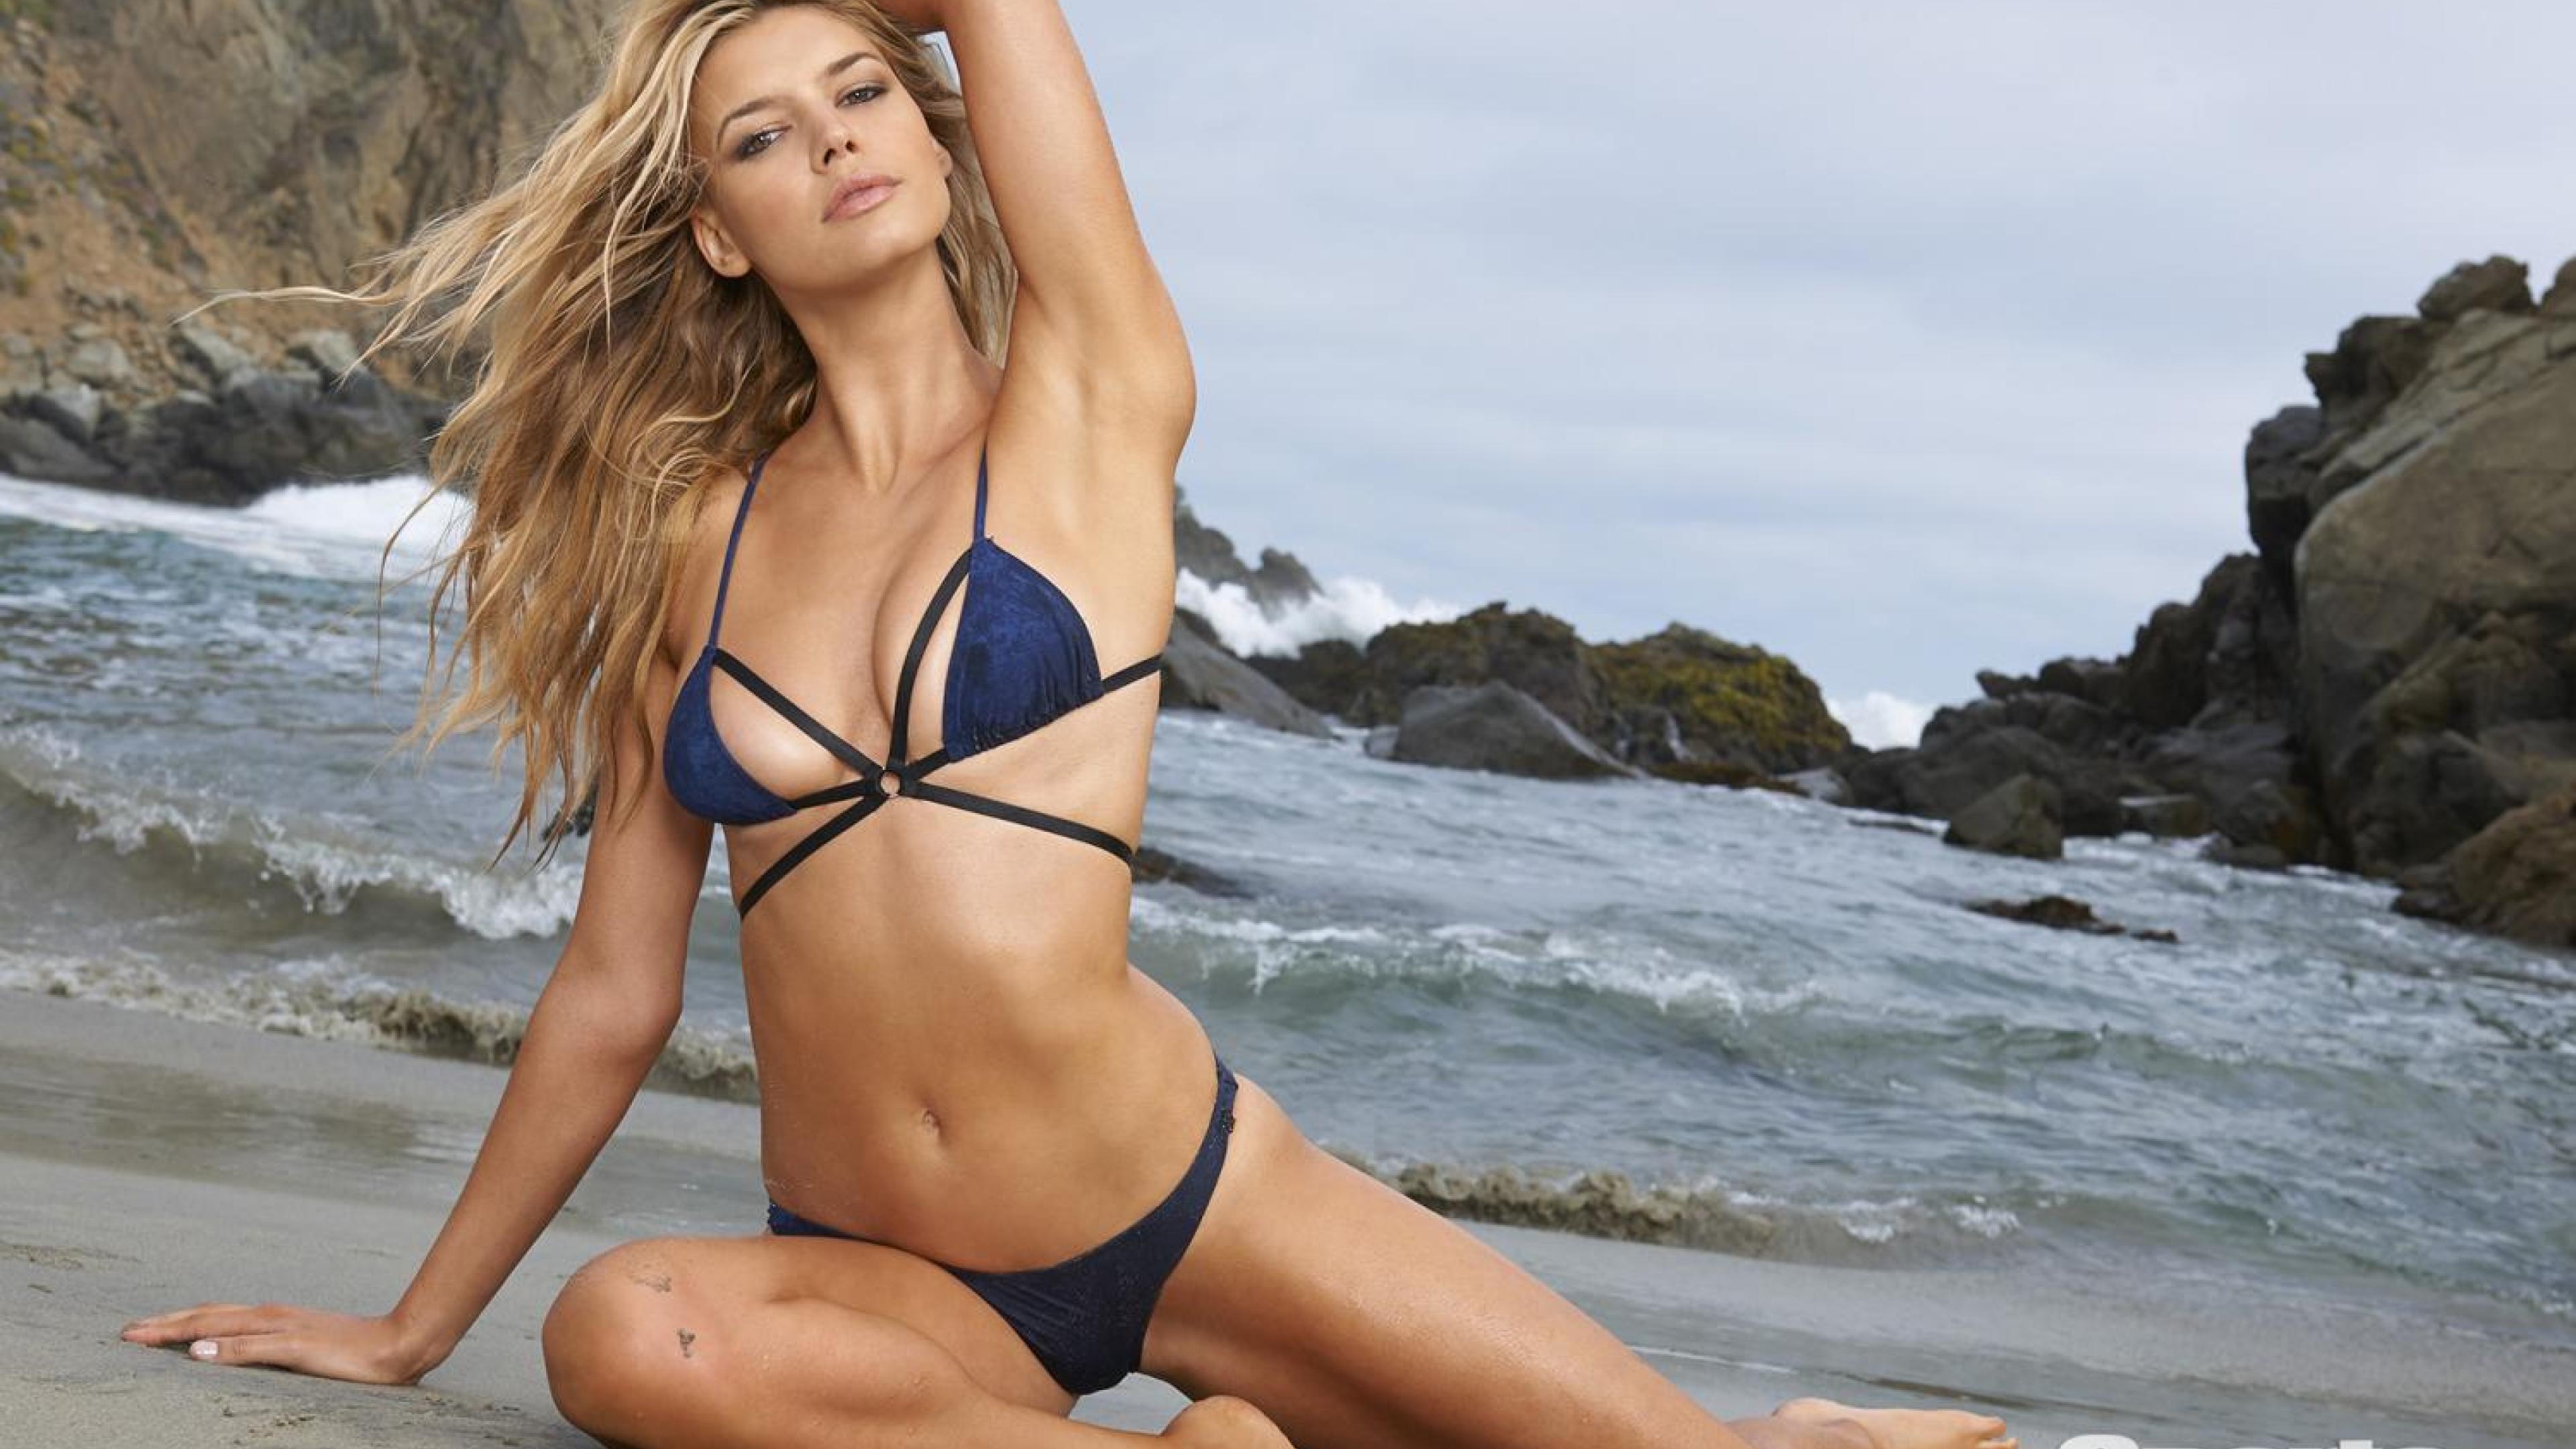 Kelly rohrbach in blue bikini hd wallpaper - Hd bikini wallpaper download ...